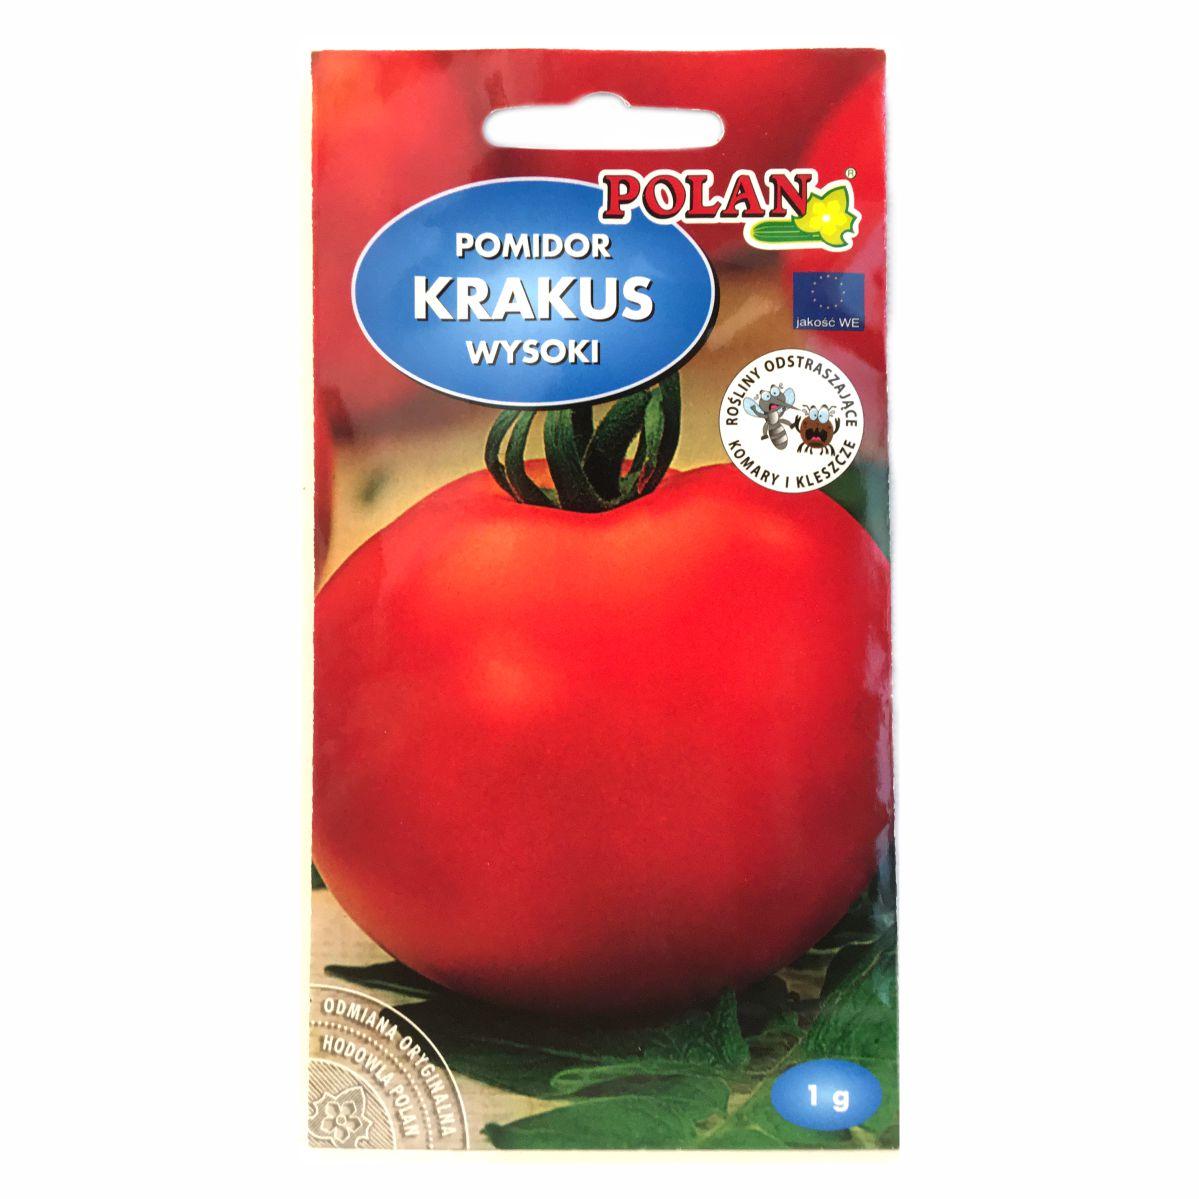 Pomidor Krakus nasiona Polan